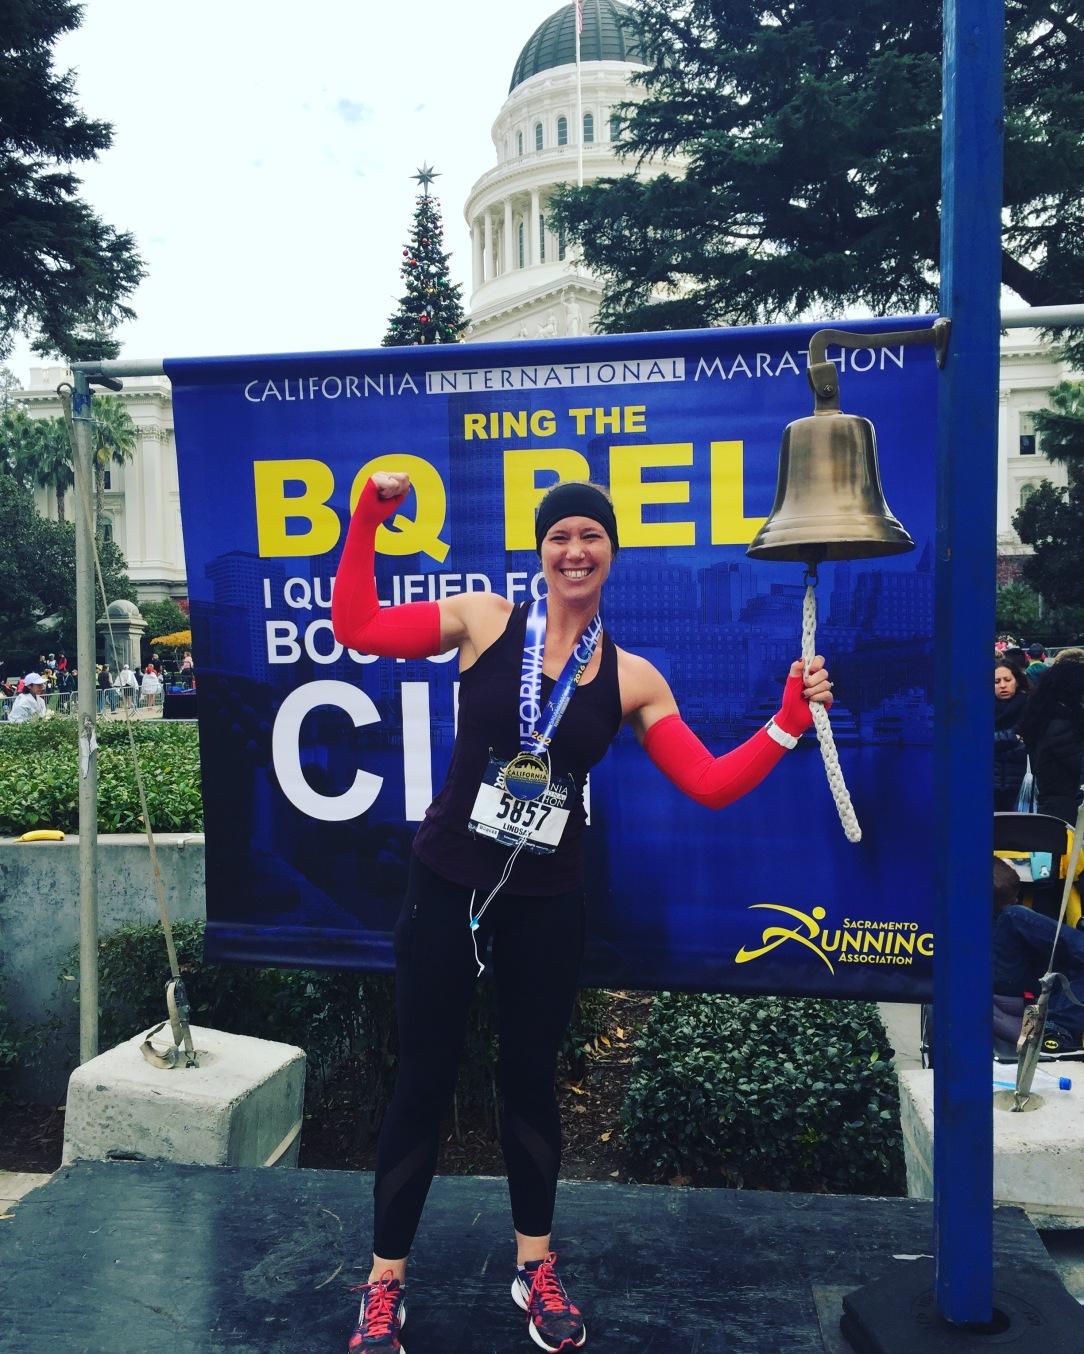 Finally ringing the BQ bell!